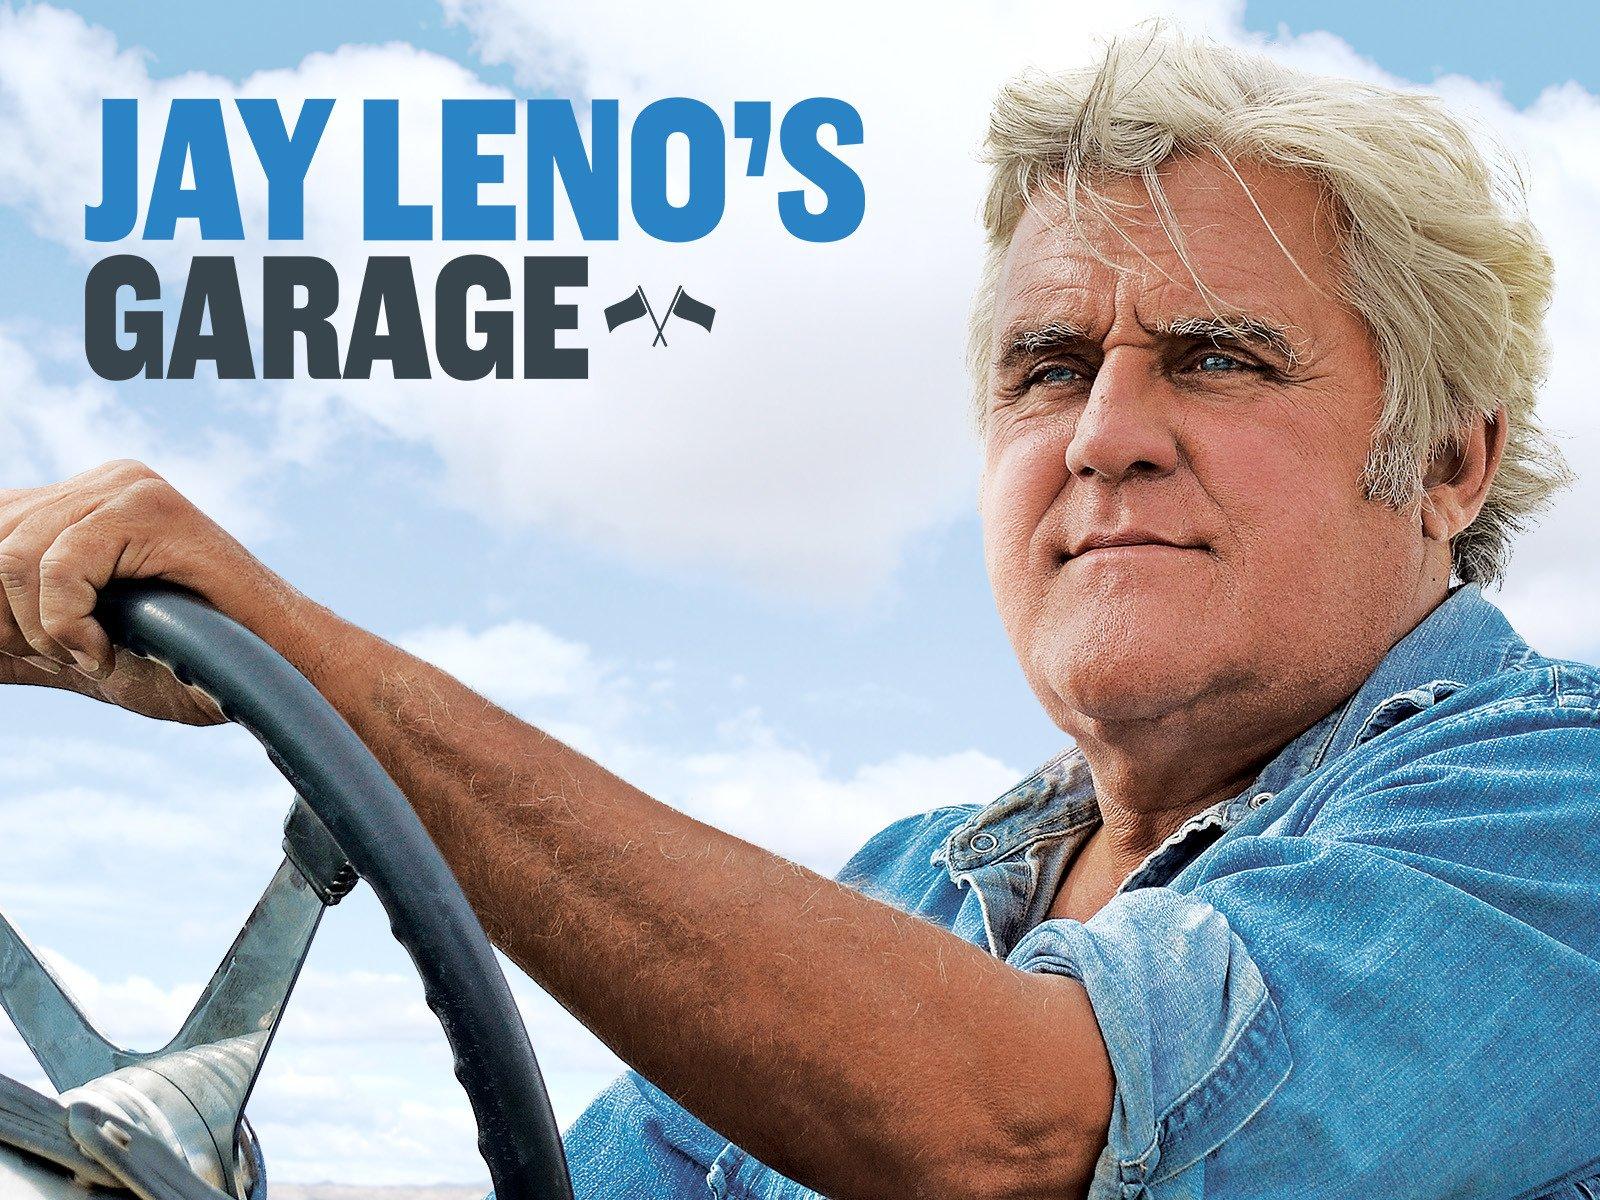 Jay Leno's Garage - Season 1